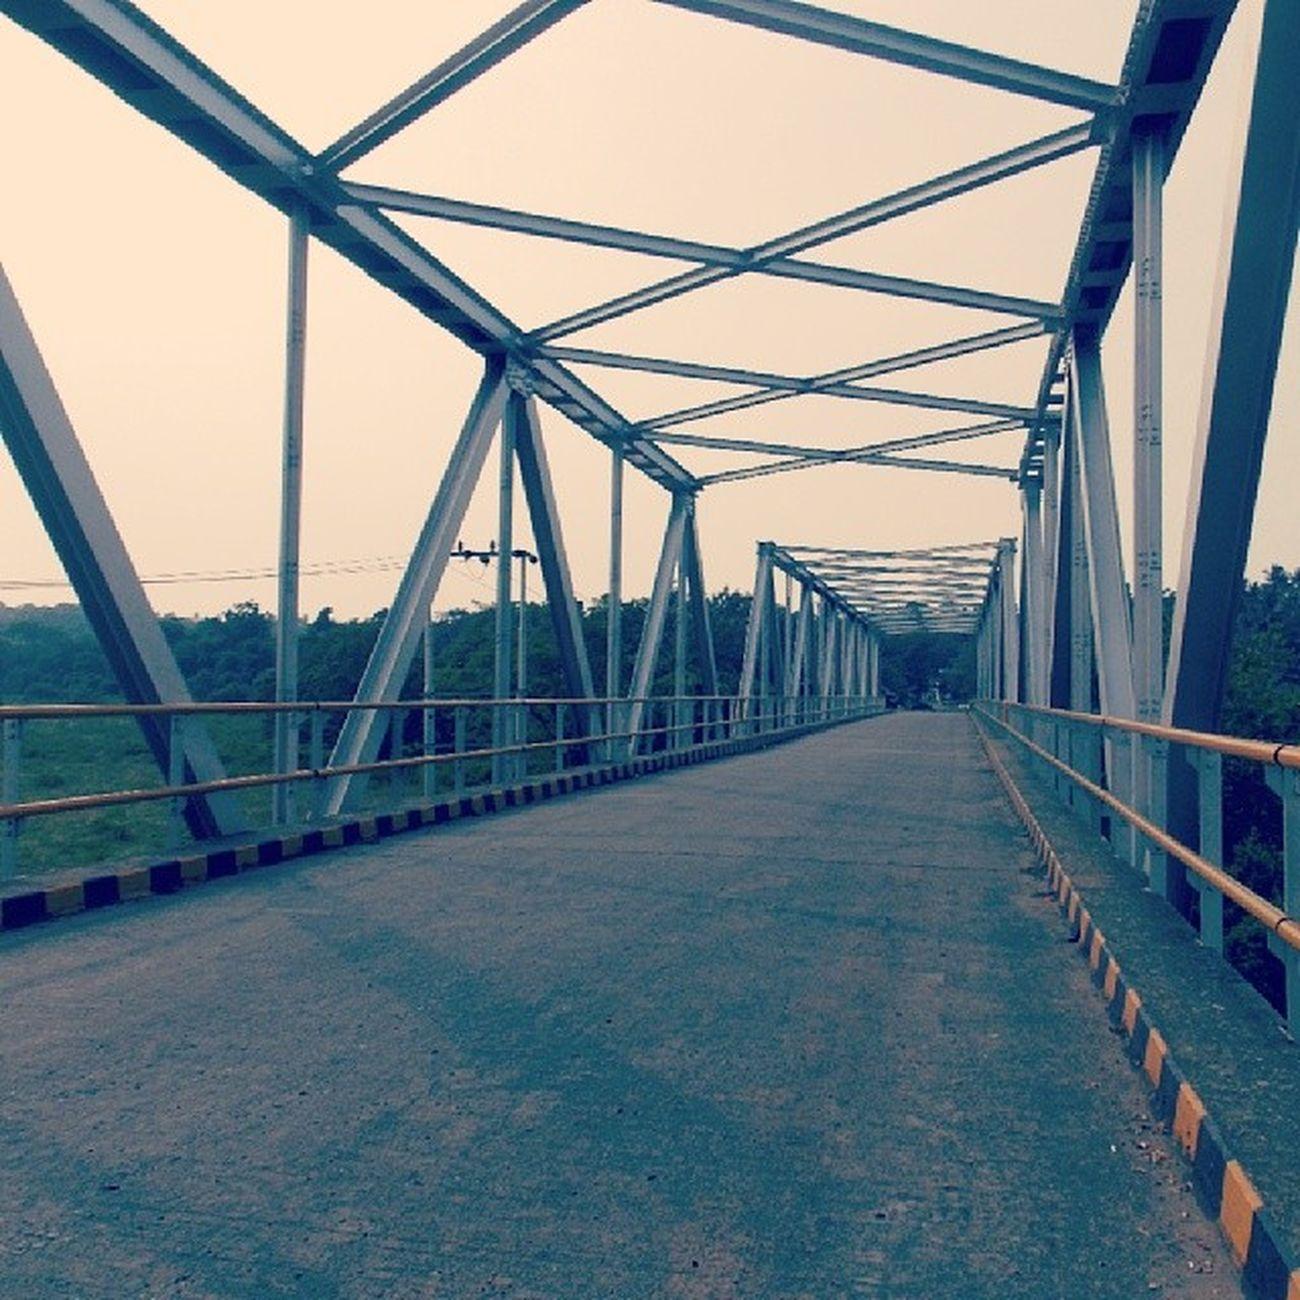 Jembatan Padangguci Instagram Gerisusino